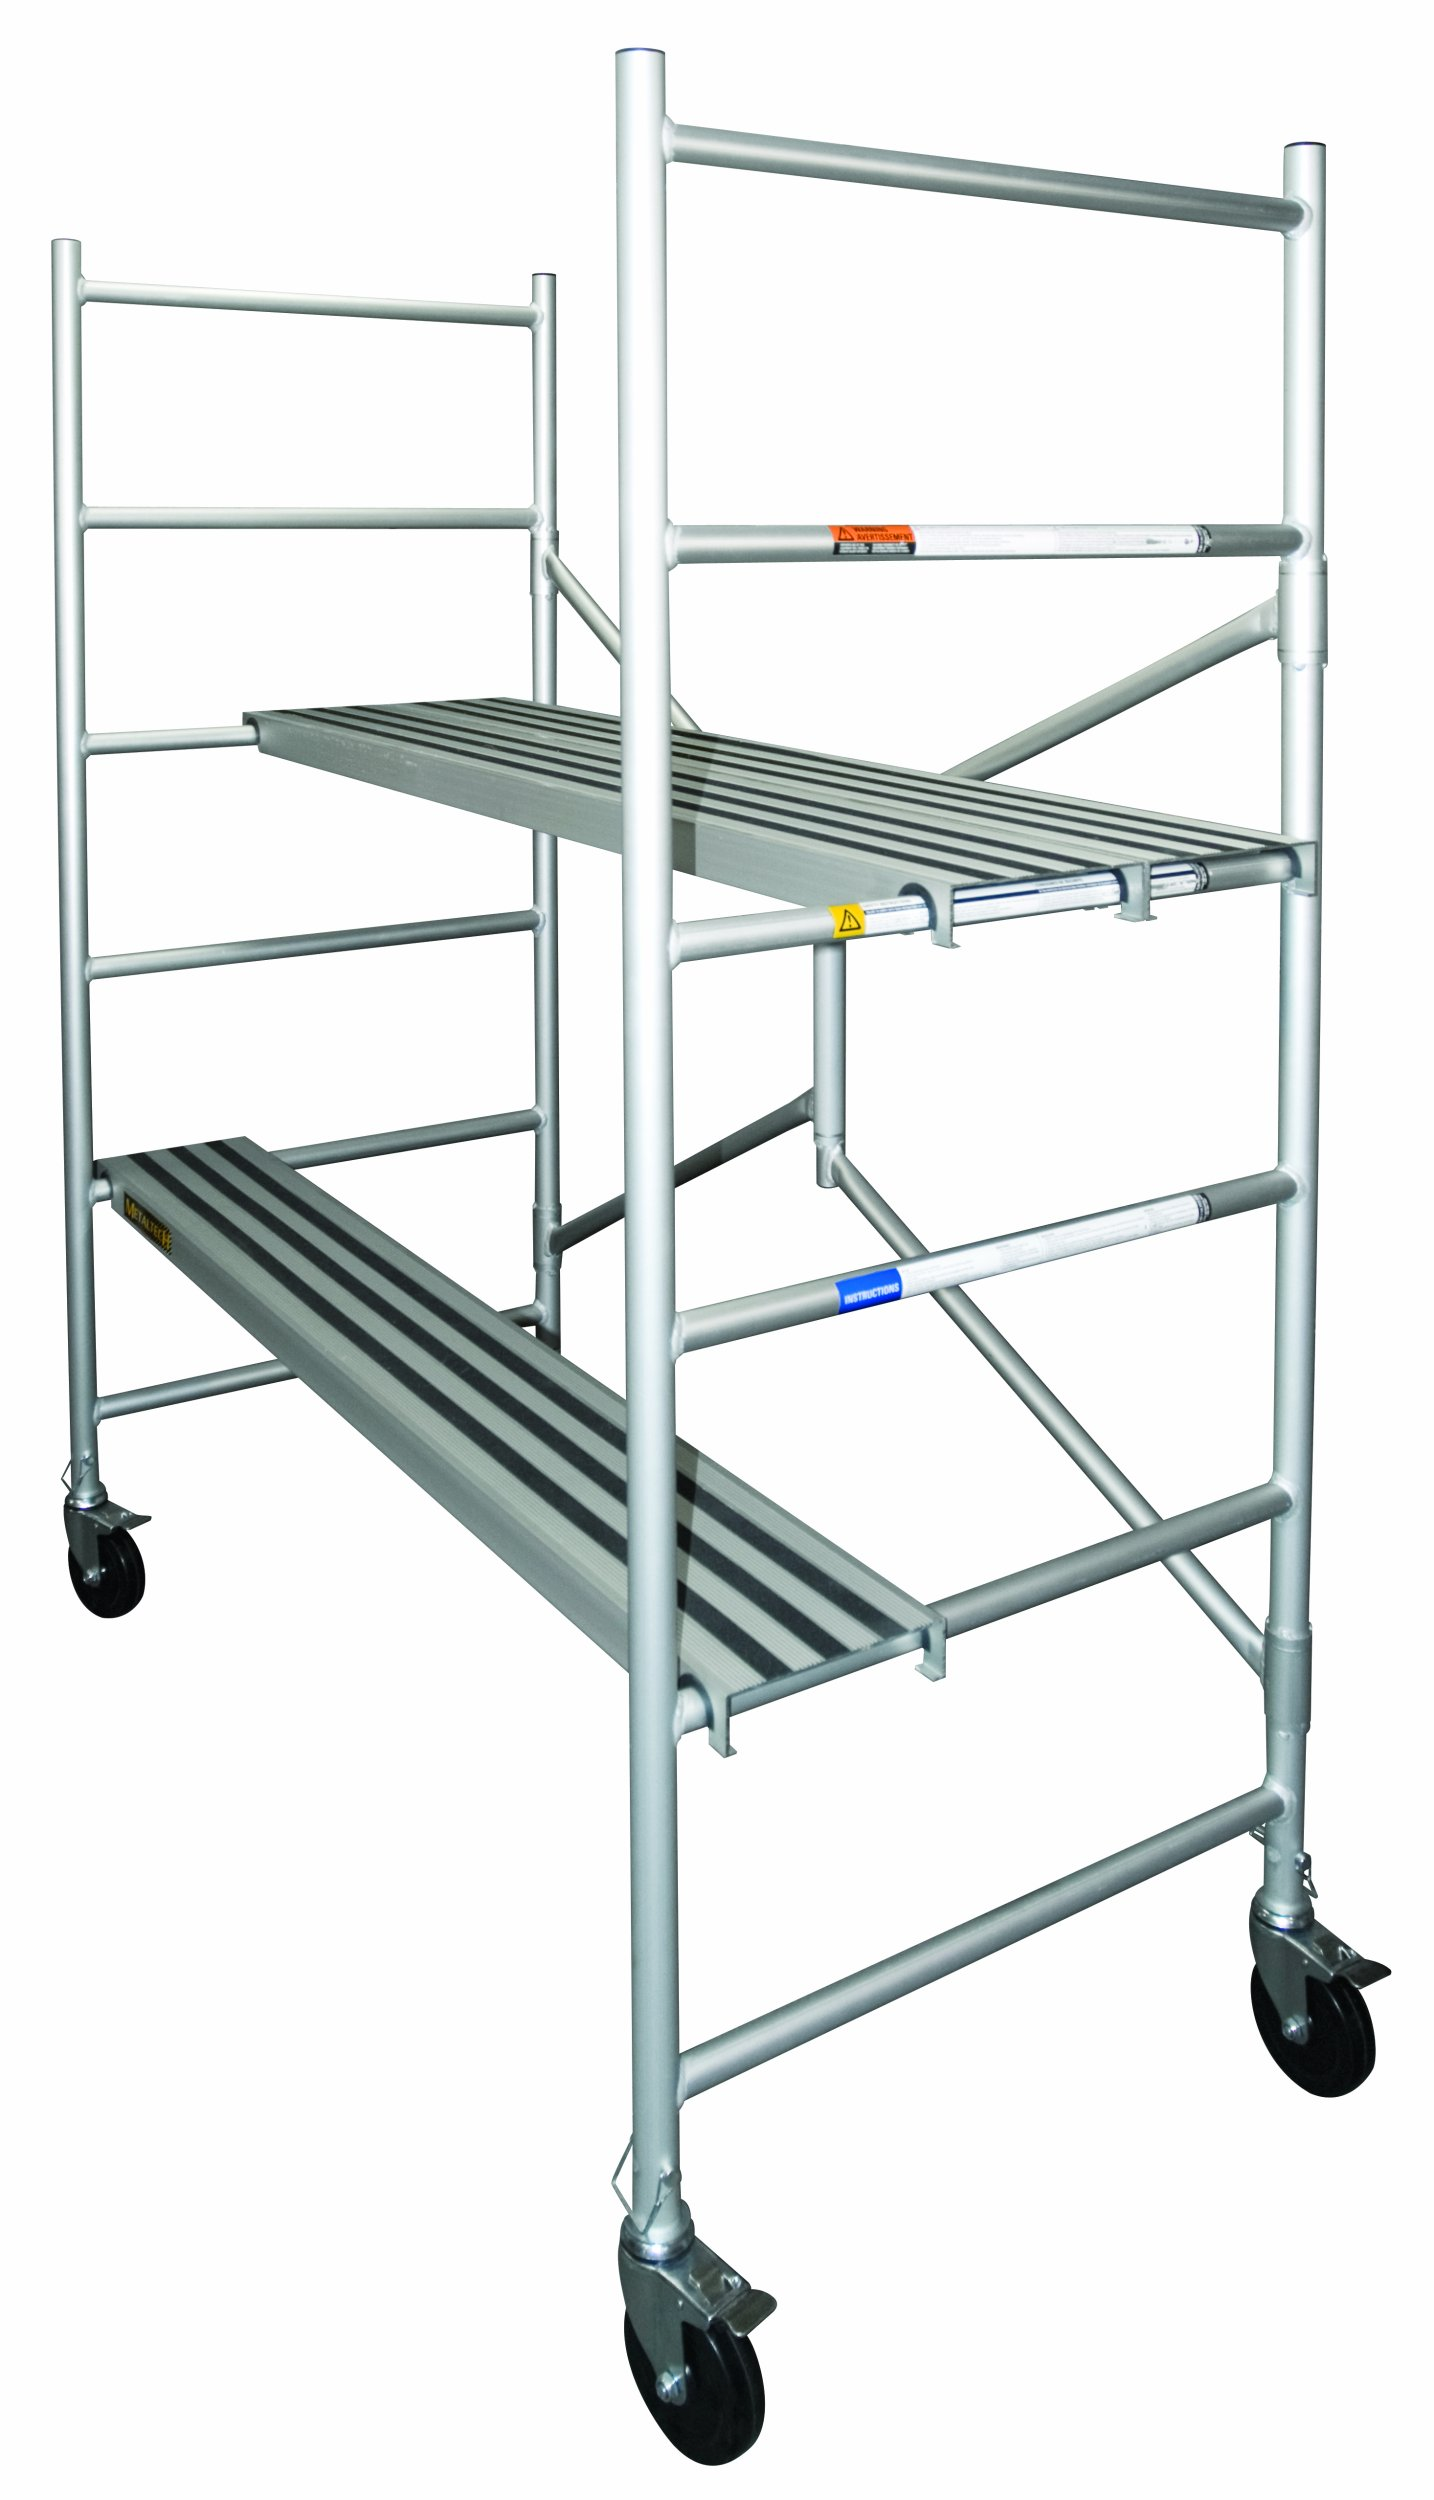 Xtend & Climb MAXI Round Aluminum Scaffold by Xtend & Climb